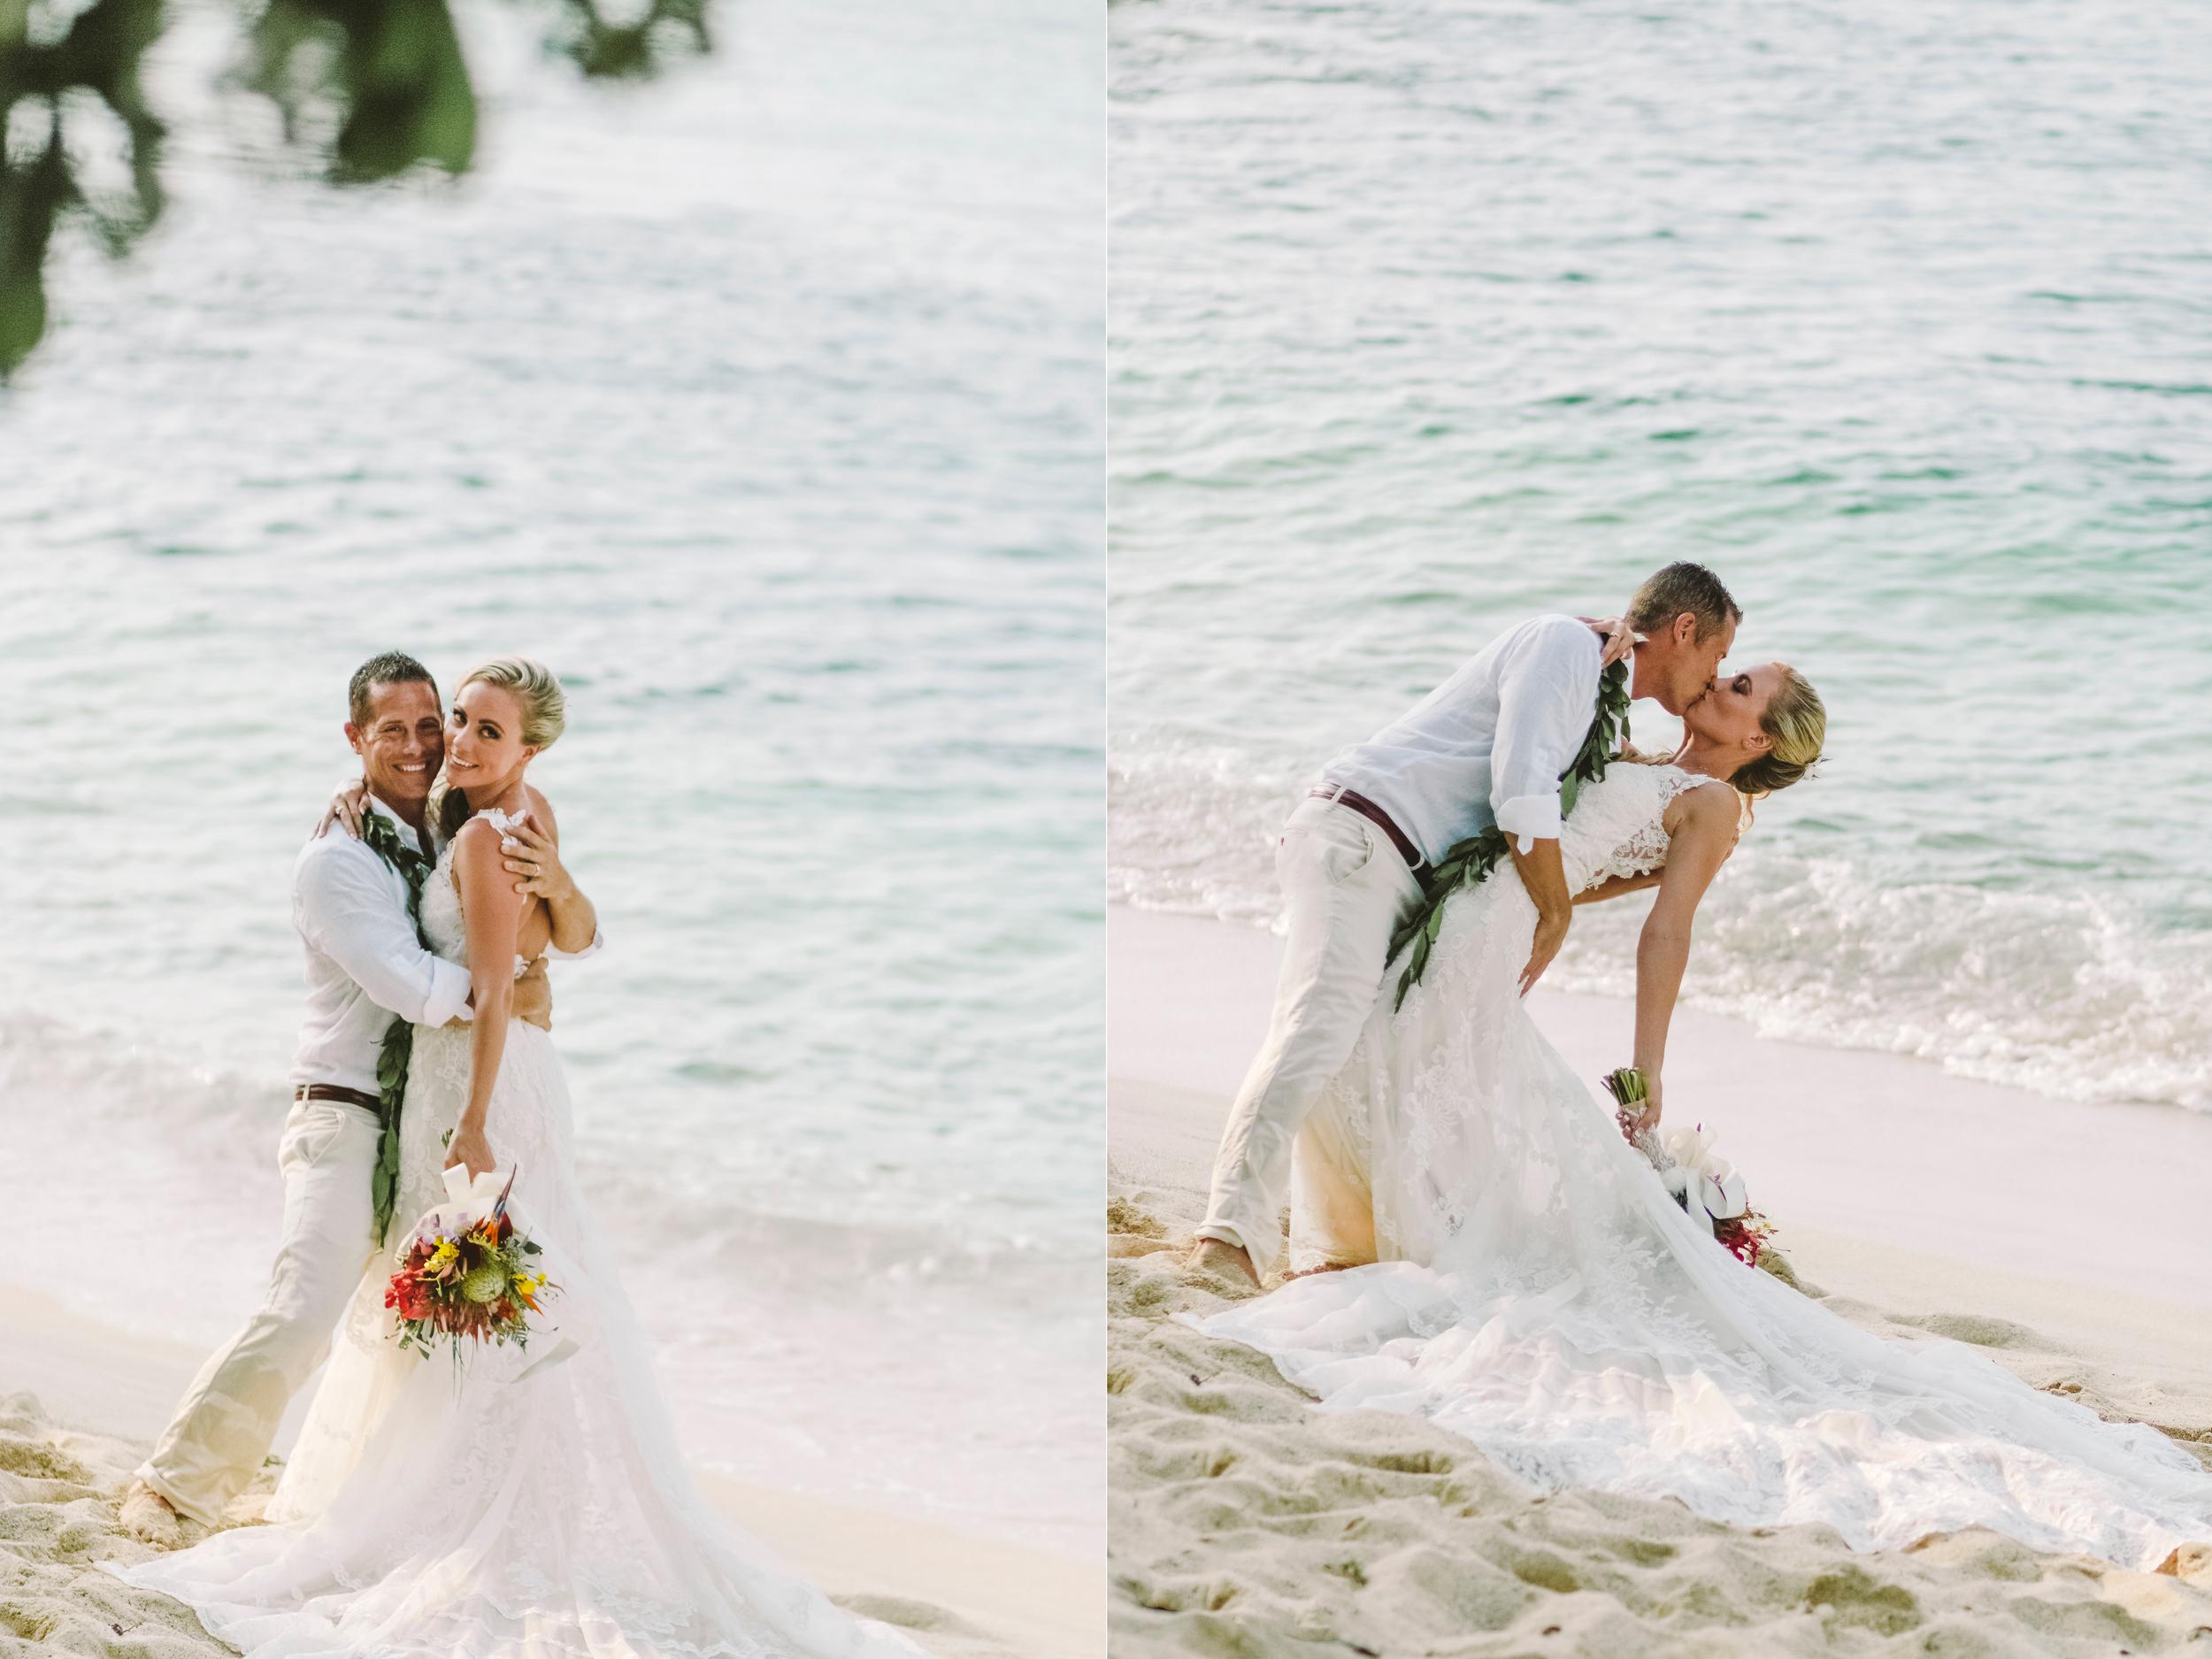 angie-diaz-photography-hawaii-wedding-photographer-kelli-jay-86.jpg